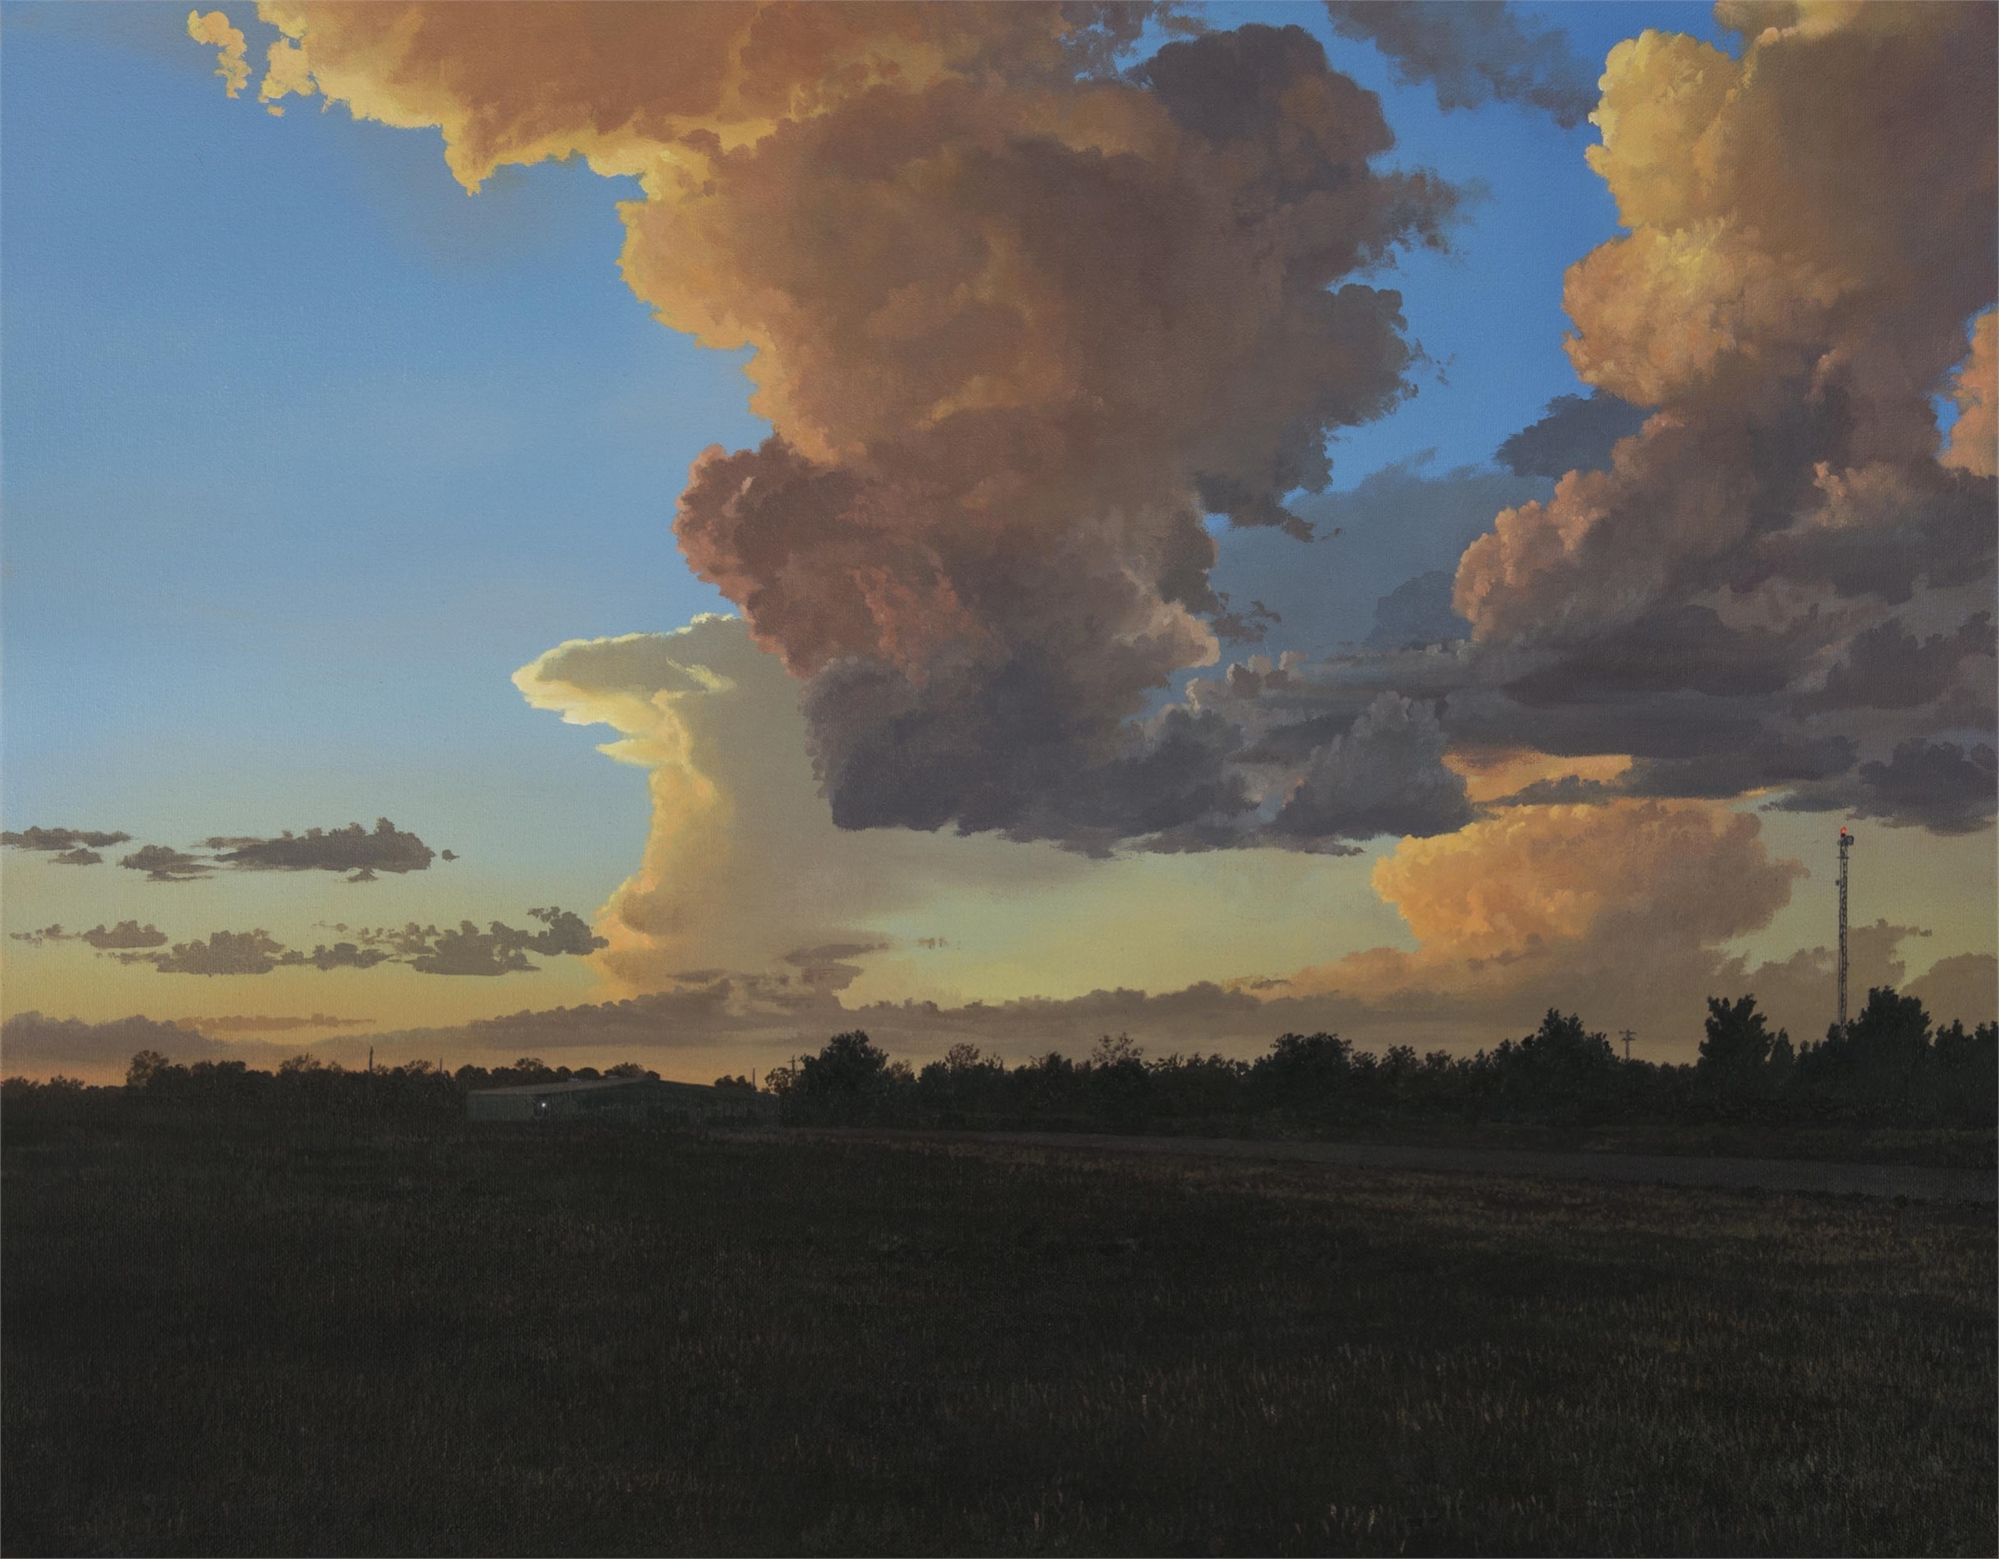 Late Light (Texans' Twilight) by Pat Gabriel